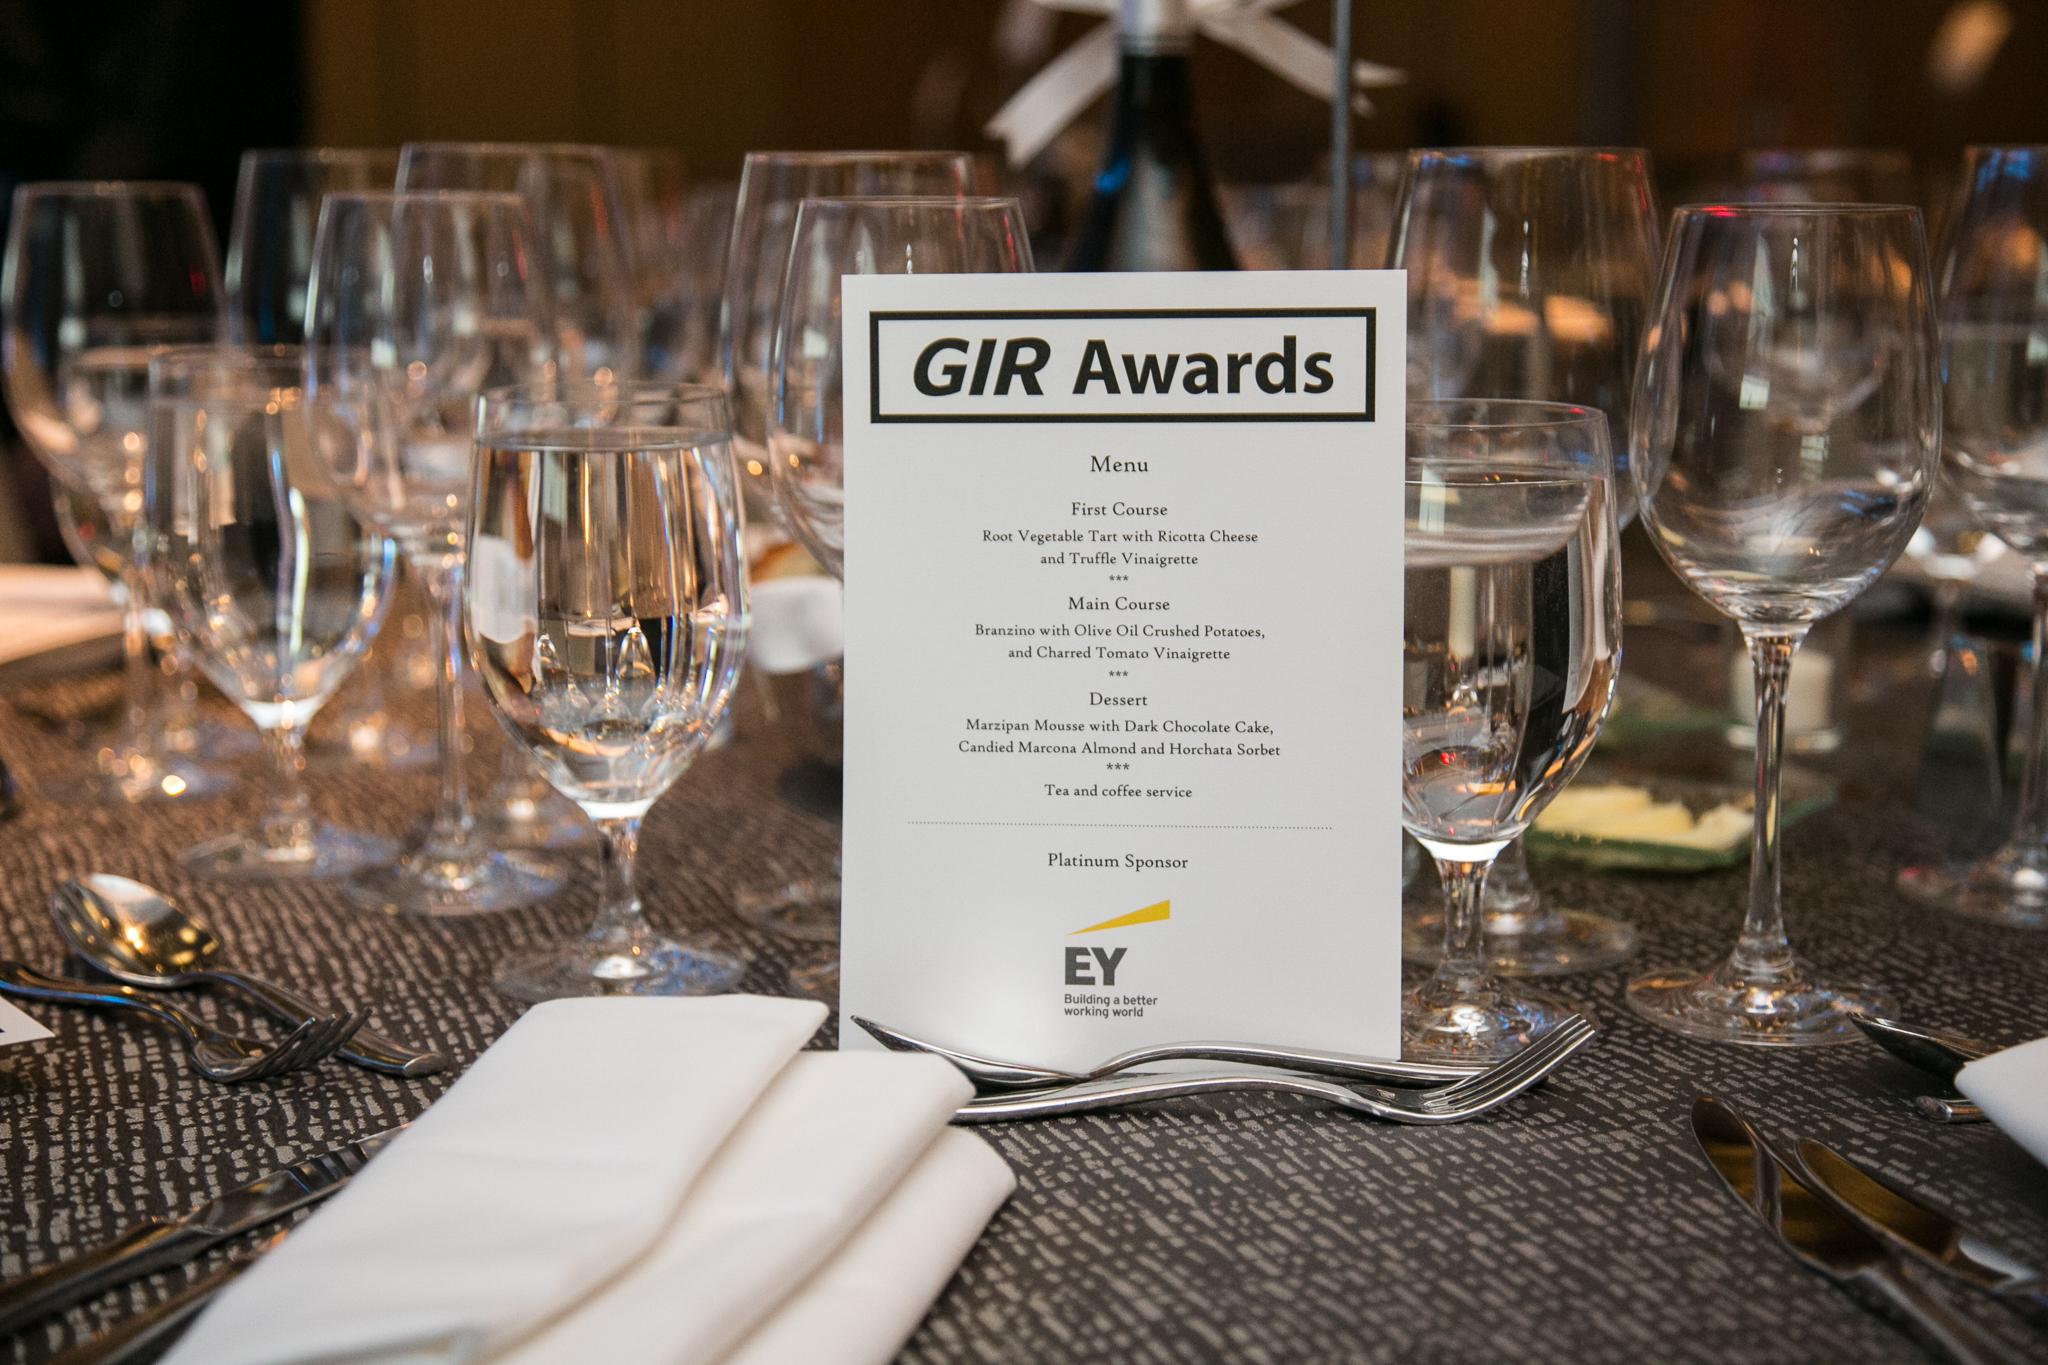 GIR Awards 2017 – Enforcement Agency or Prosecutor of the Year